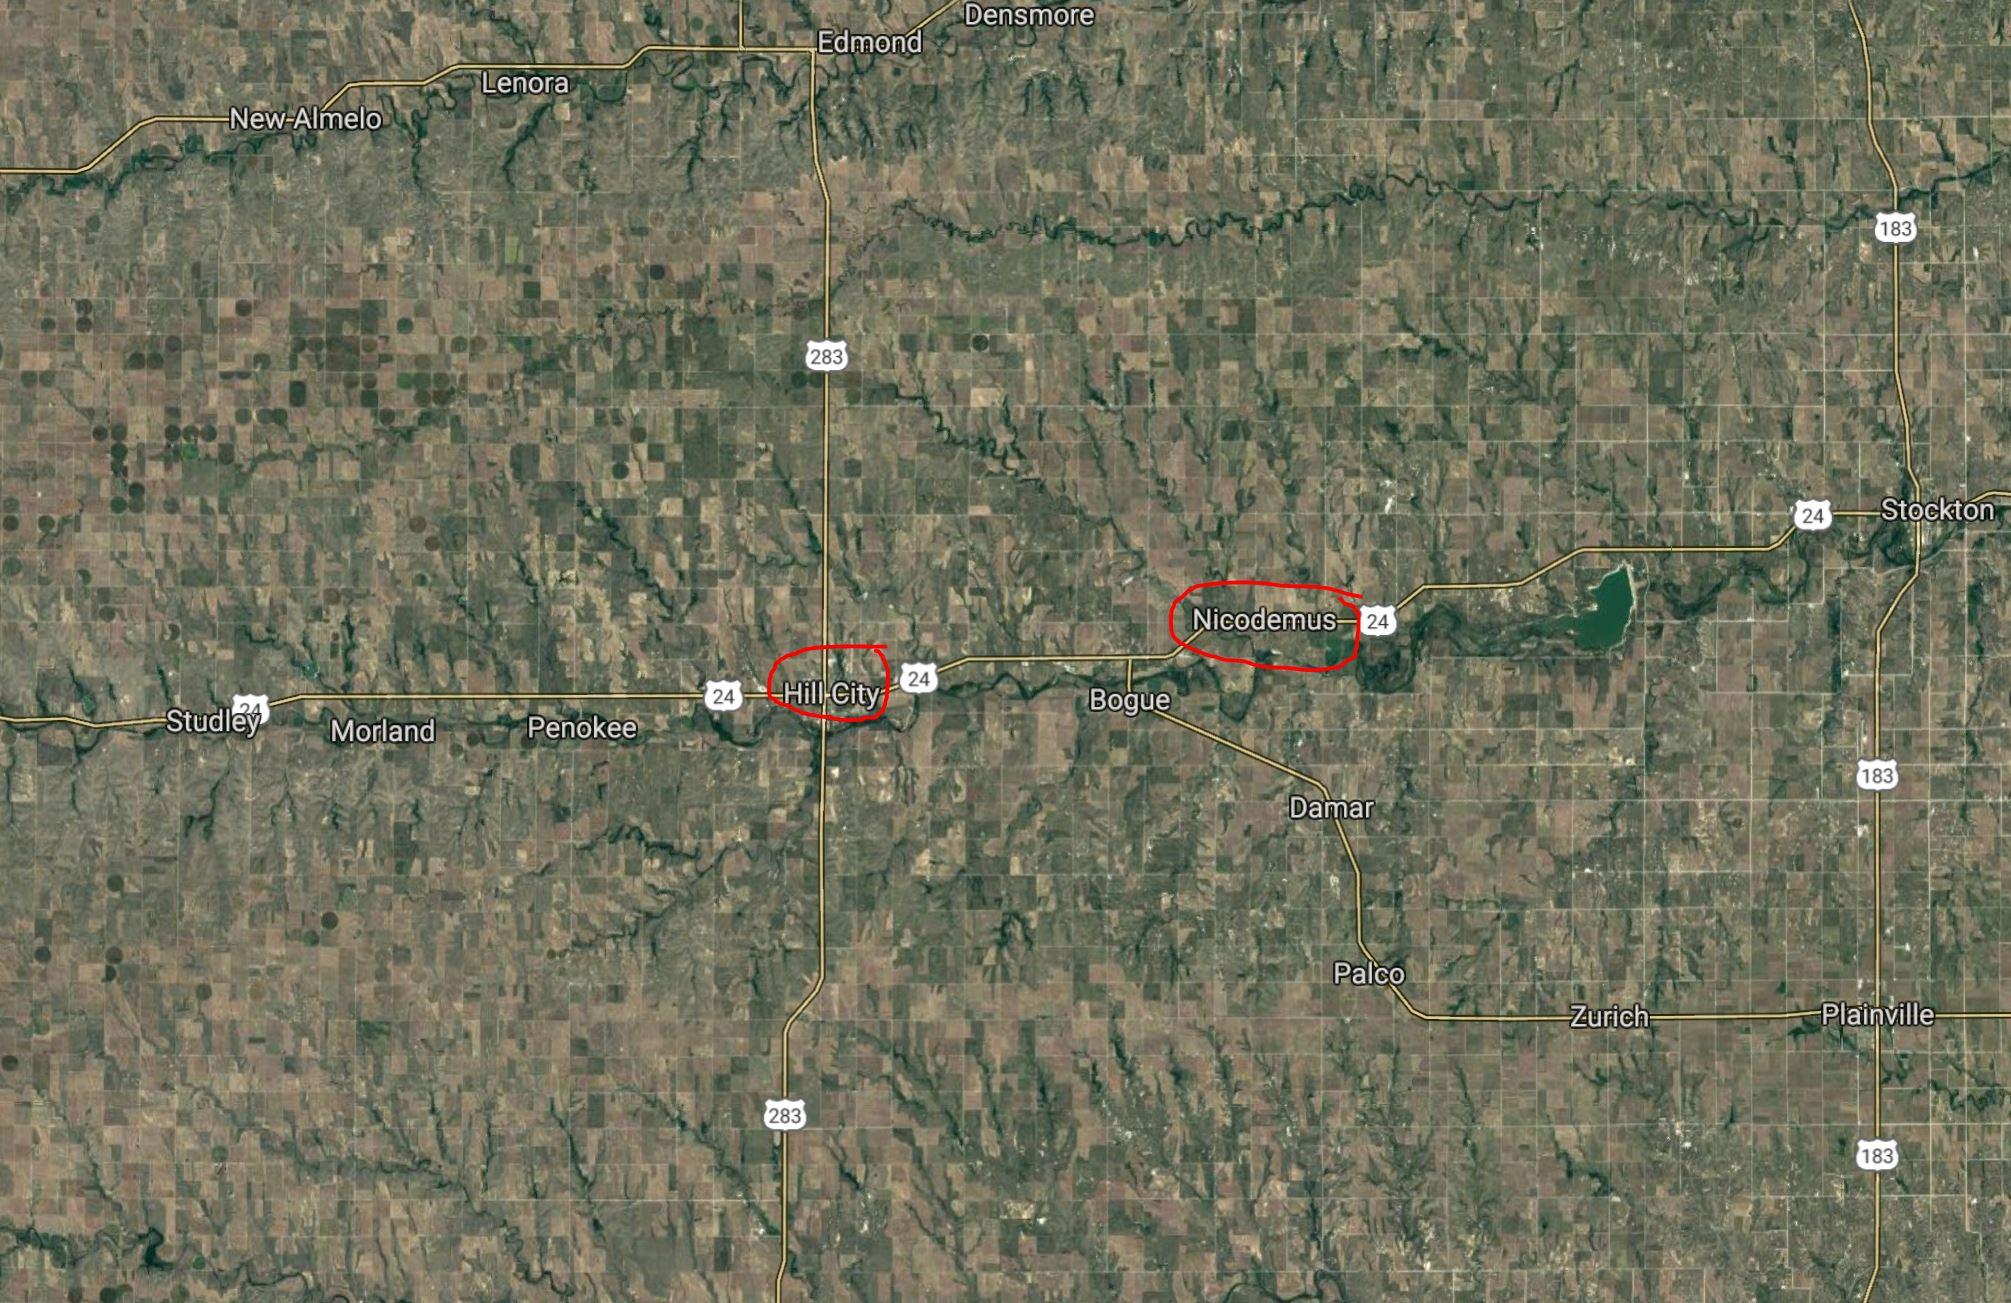 Location of both Hill City and Nicodemus in northwest Kansas (image courtesy of maps.google.com)